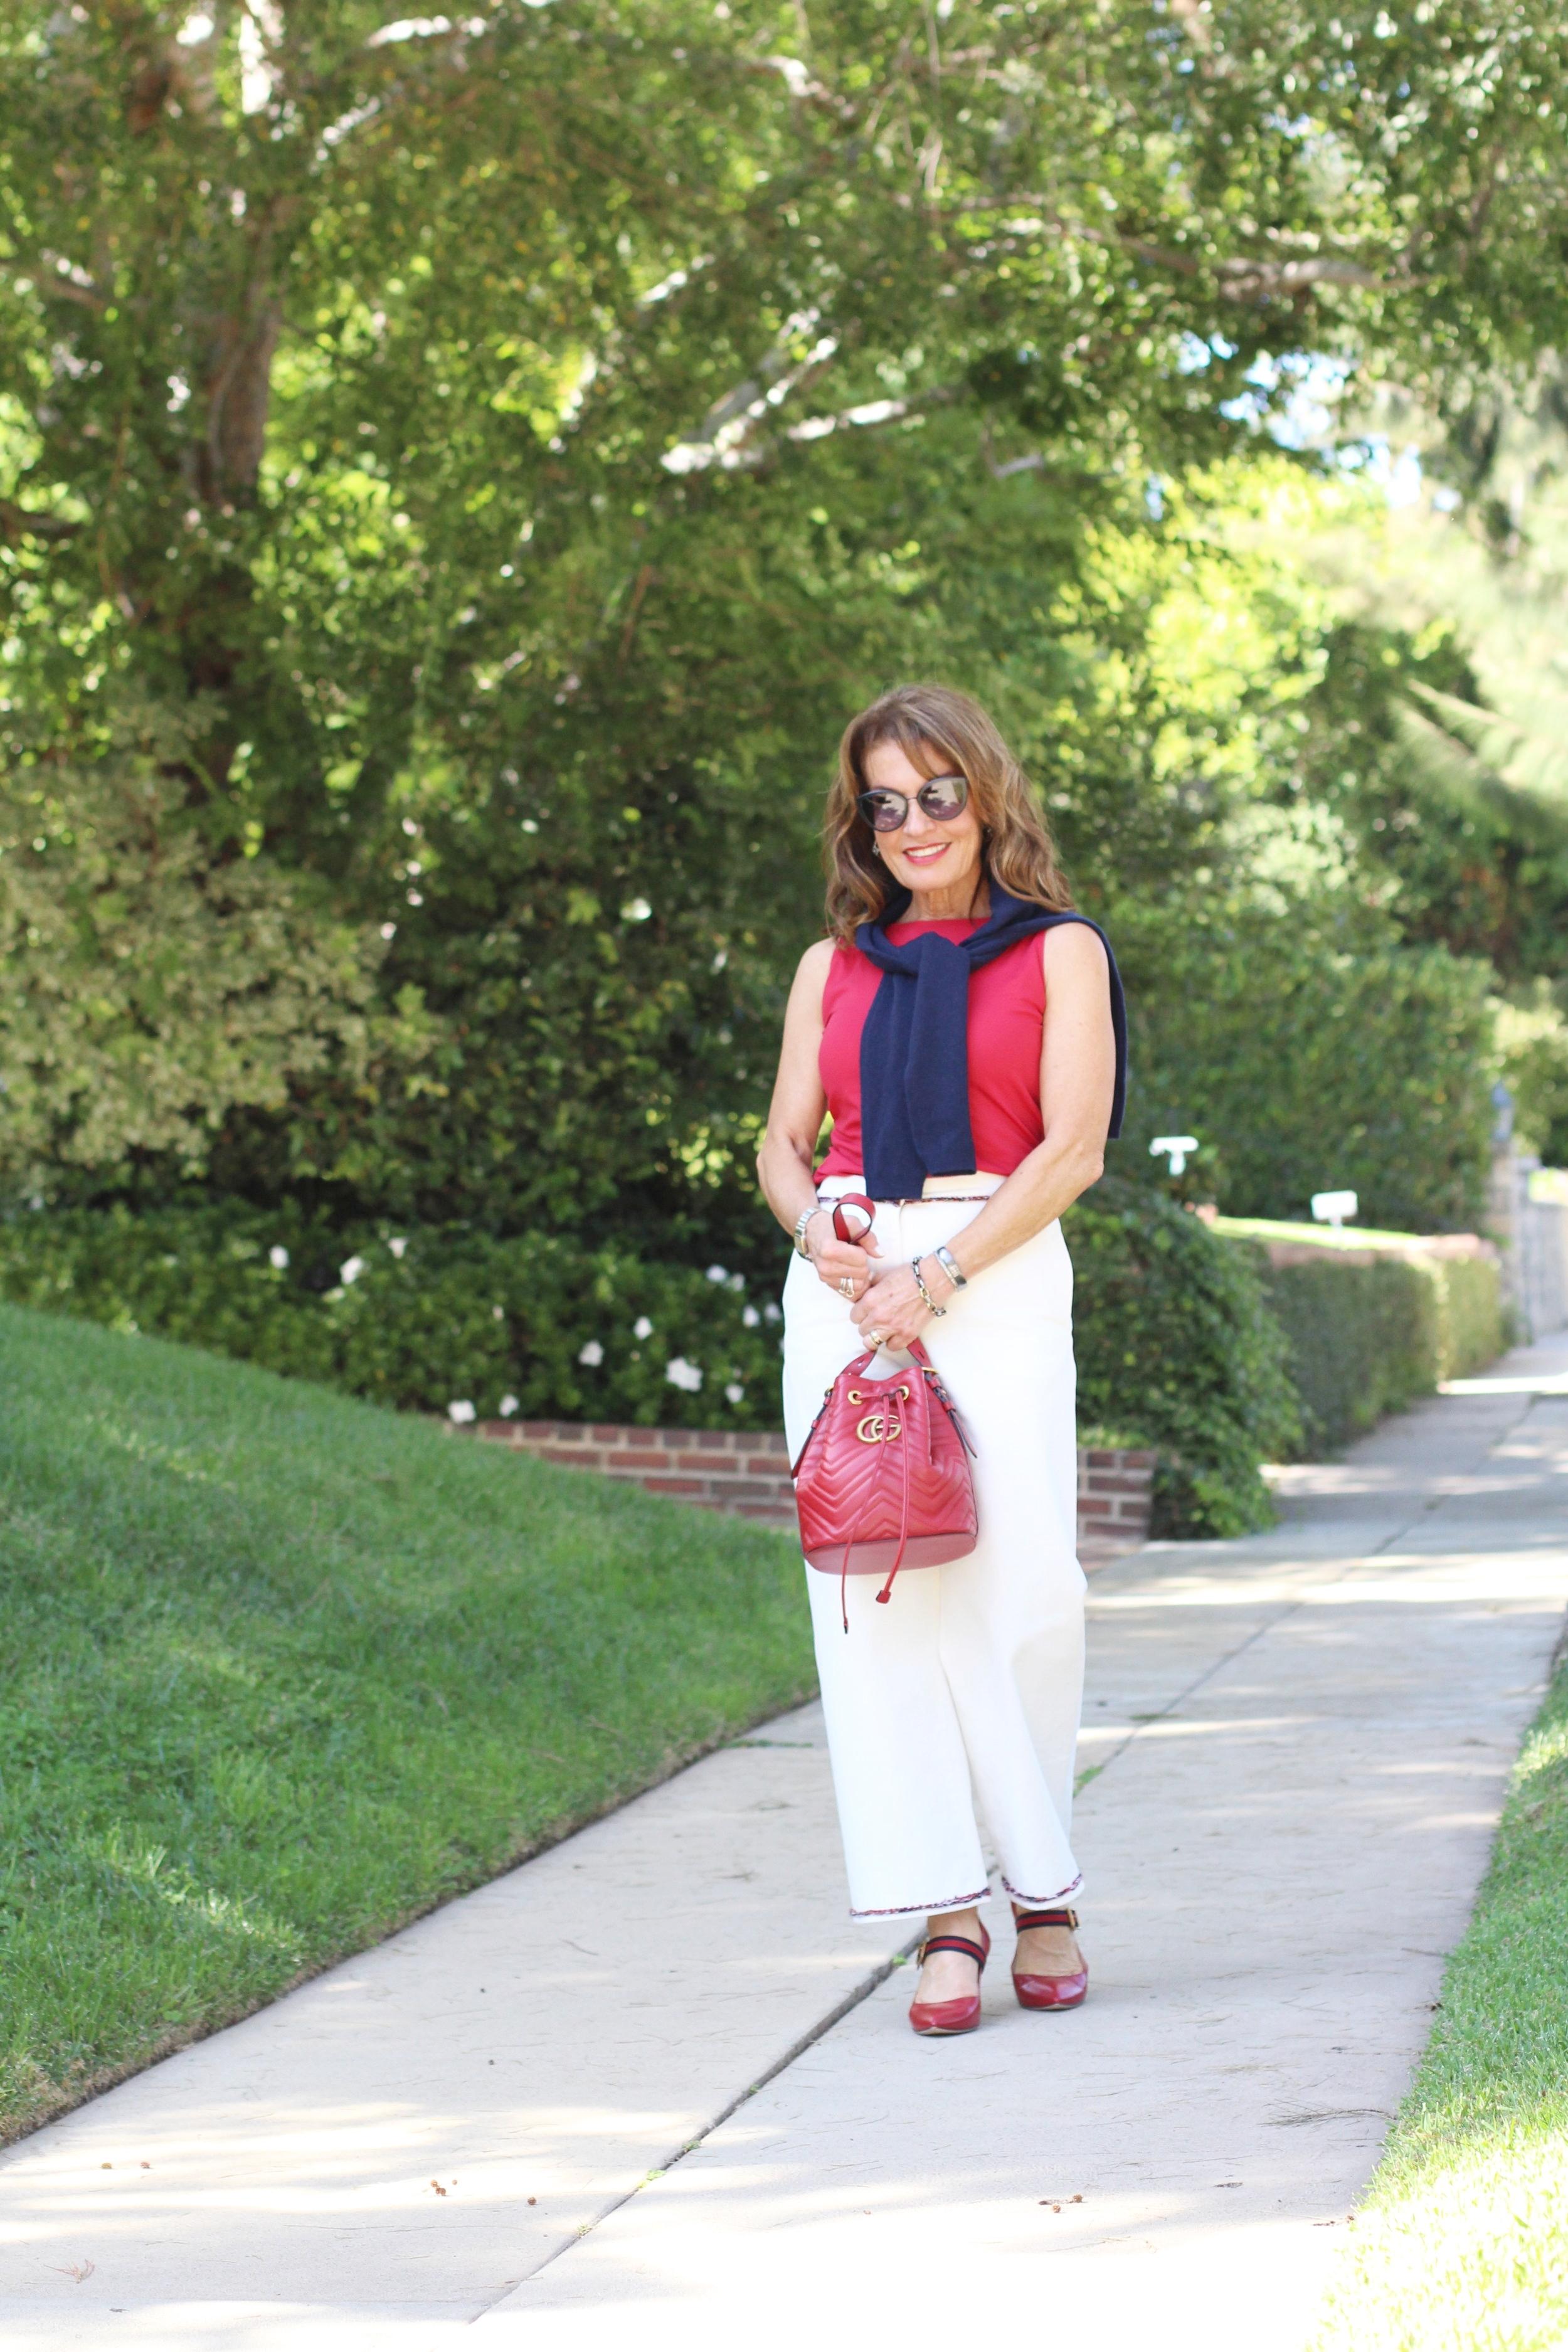 Chanel pants,    Worth New York top   ,    C by Bloomingdales cardigan   , Gucci shoes and handbag,    Suneera bracelets   , Chanel shades.